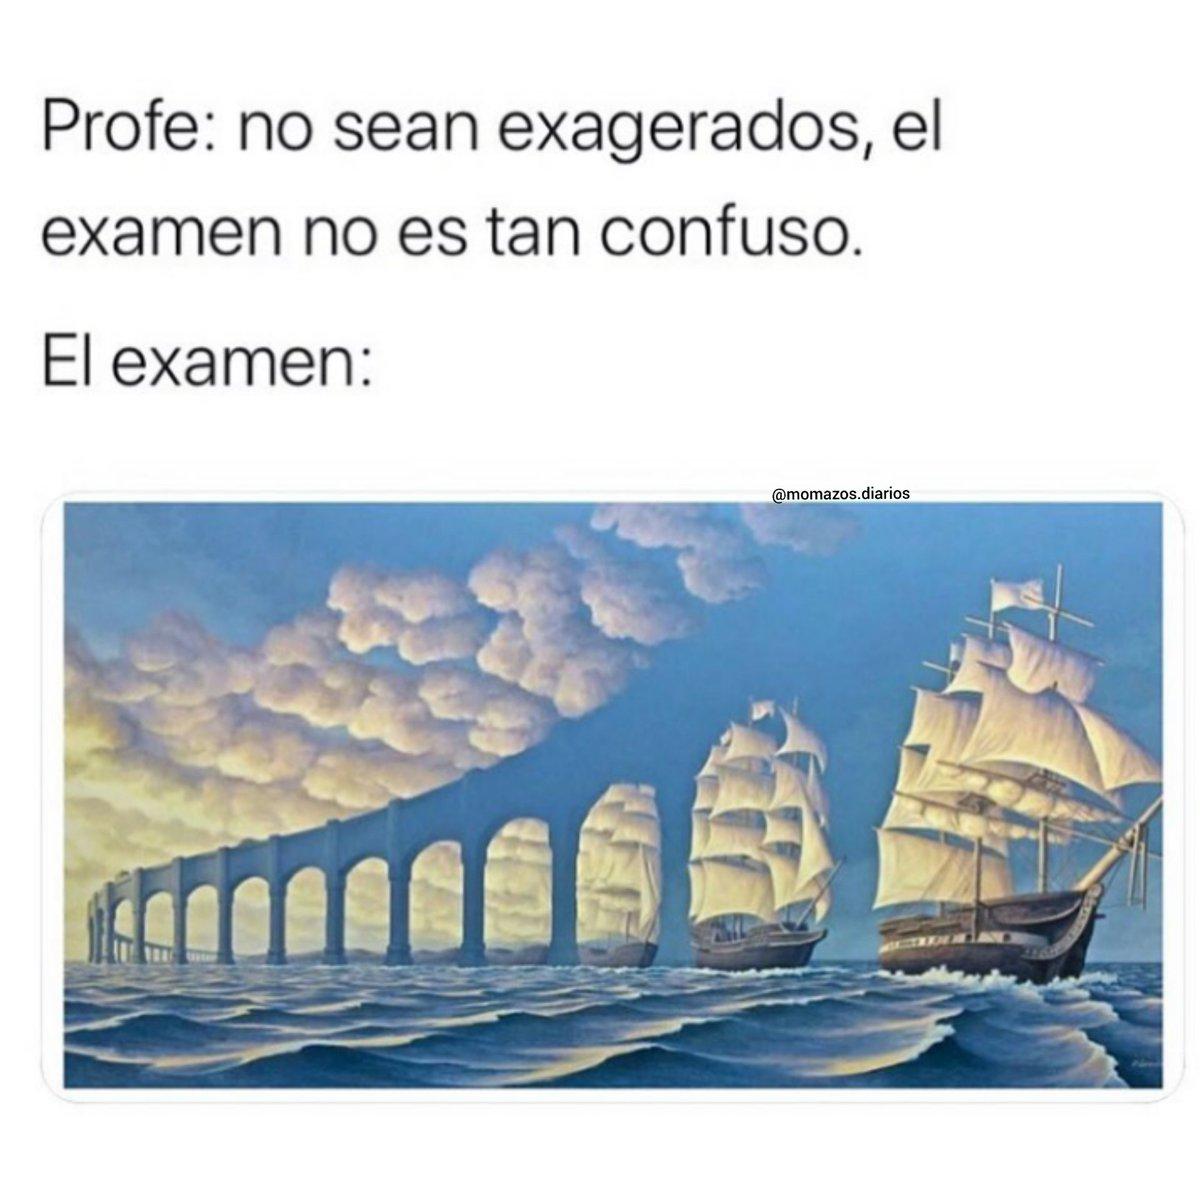 Jajajajaja #memes #memesenespañol #memesespañol #momazos #momazo #momo #momos #memes #meme #humor #chistes #gracioso #chistepic.twitter.com/01DeQV9P1c